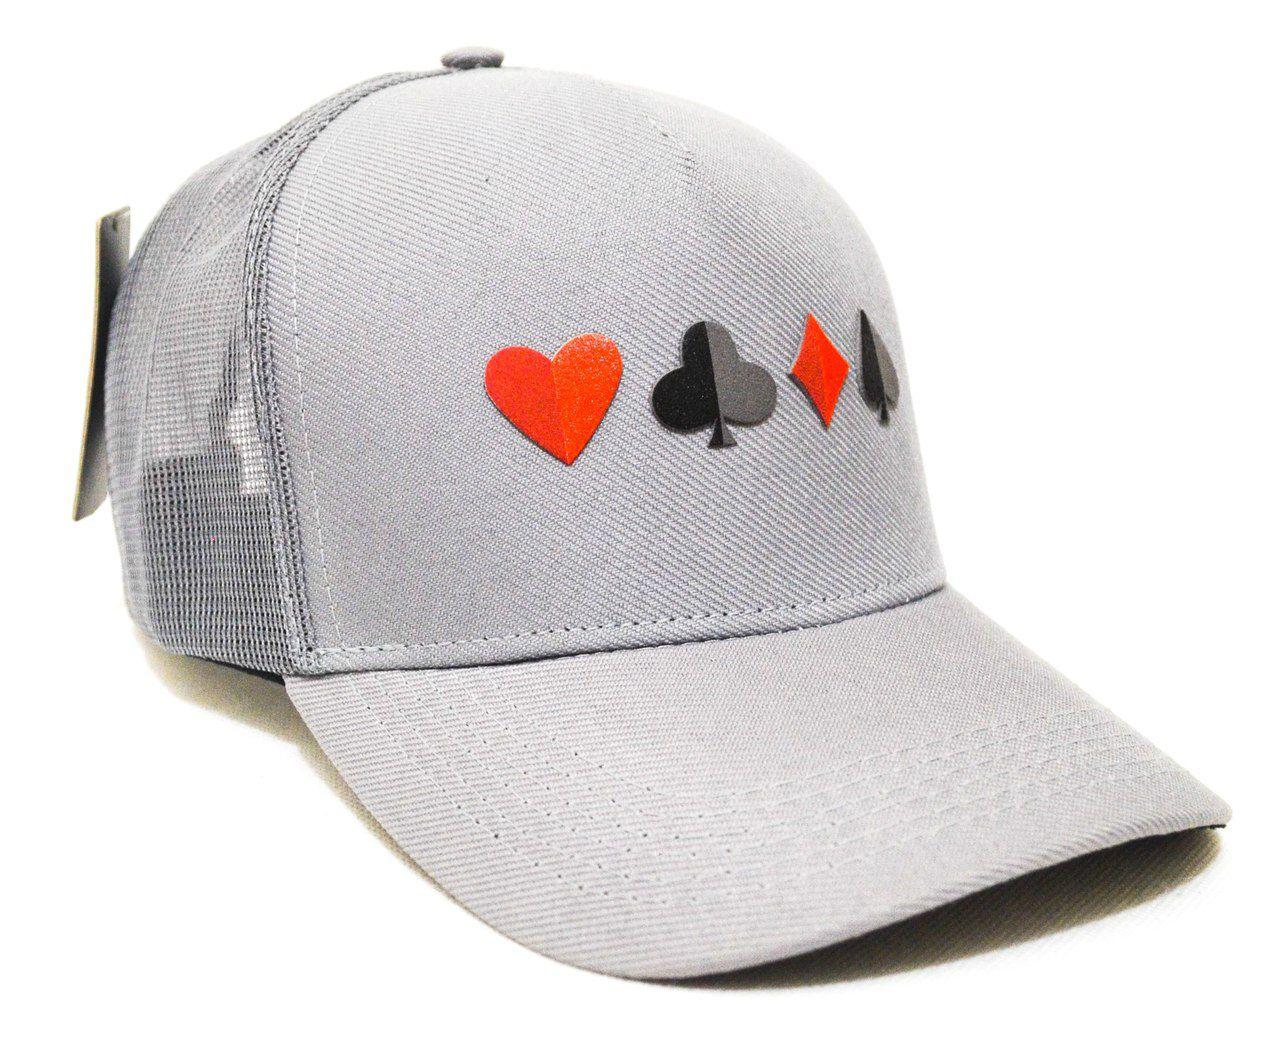 Boné Poker Naipes Cinza Aba Curva Snapback - Zap Copas Ouros Valete